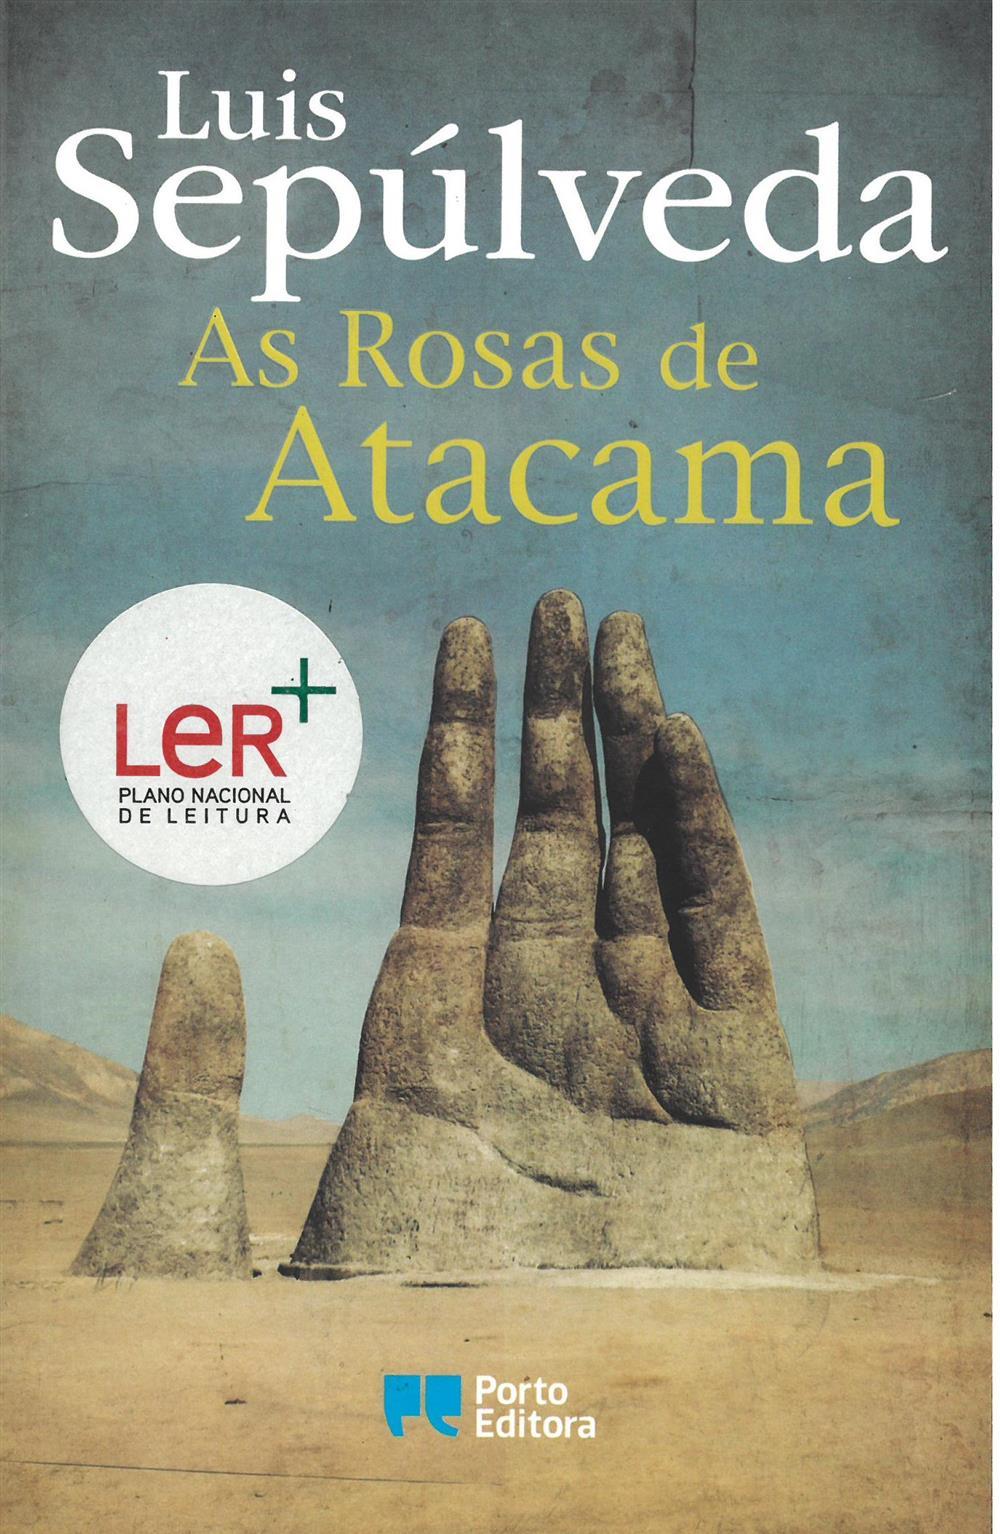 As rosas de Atacama.jpg